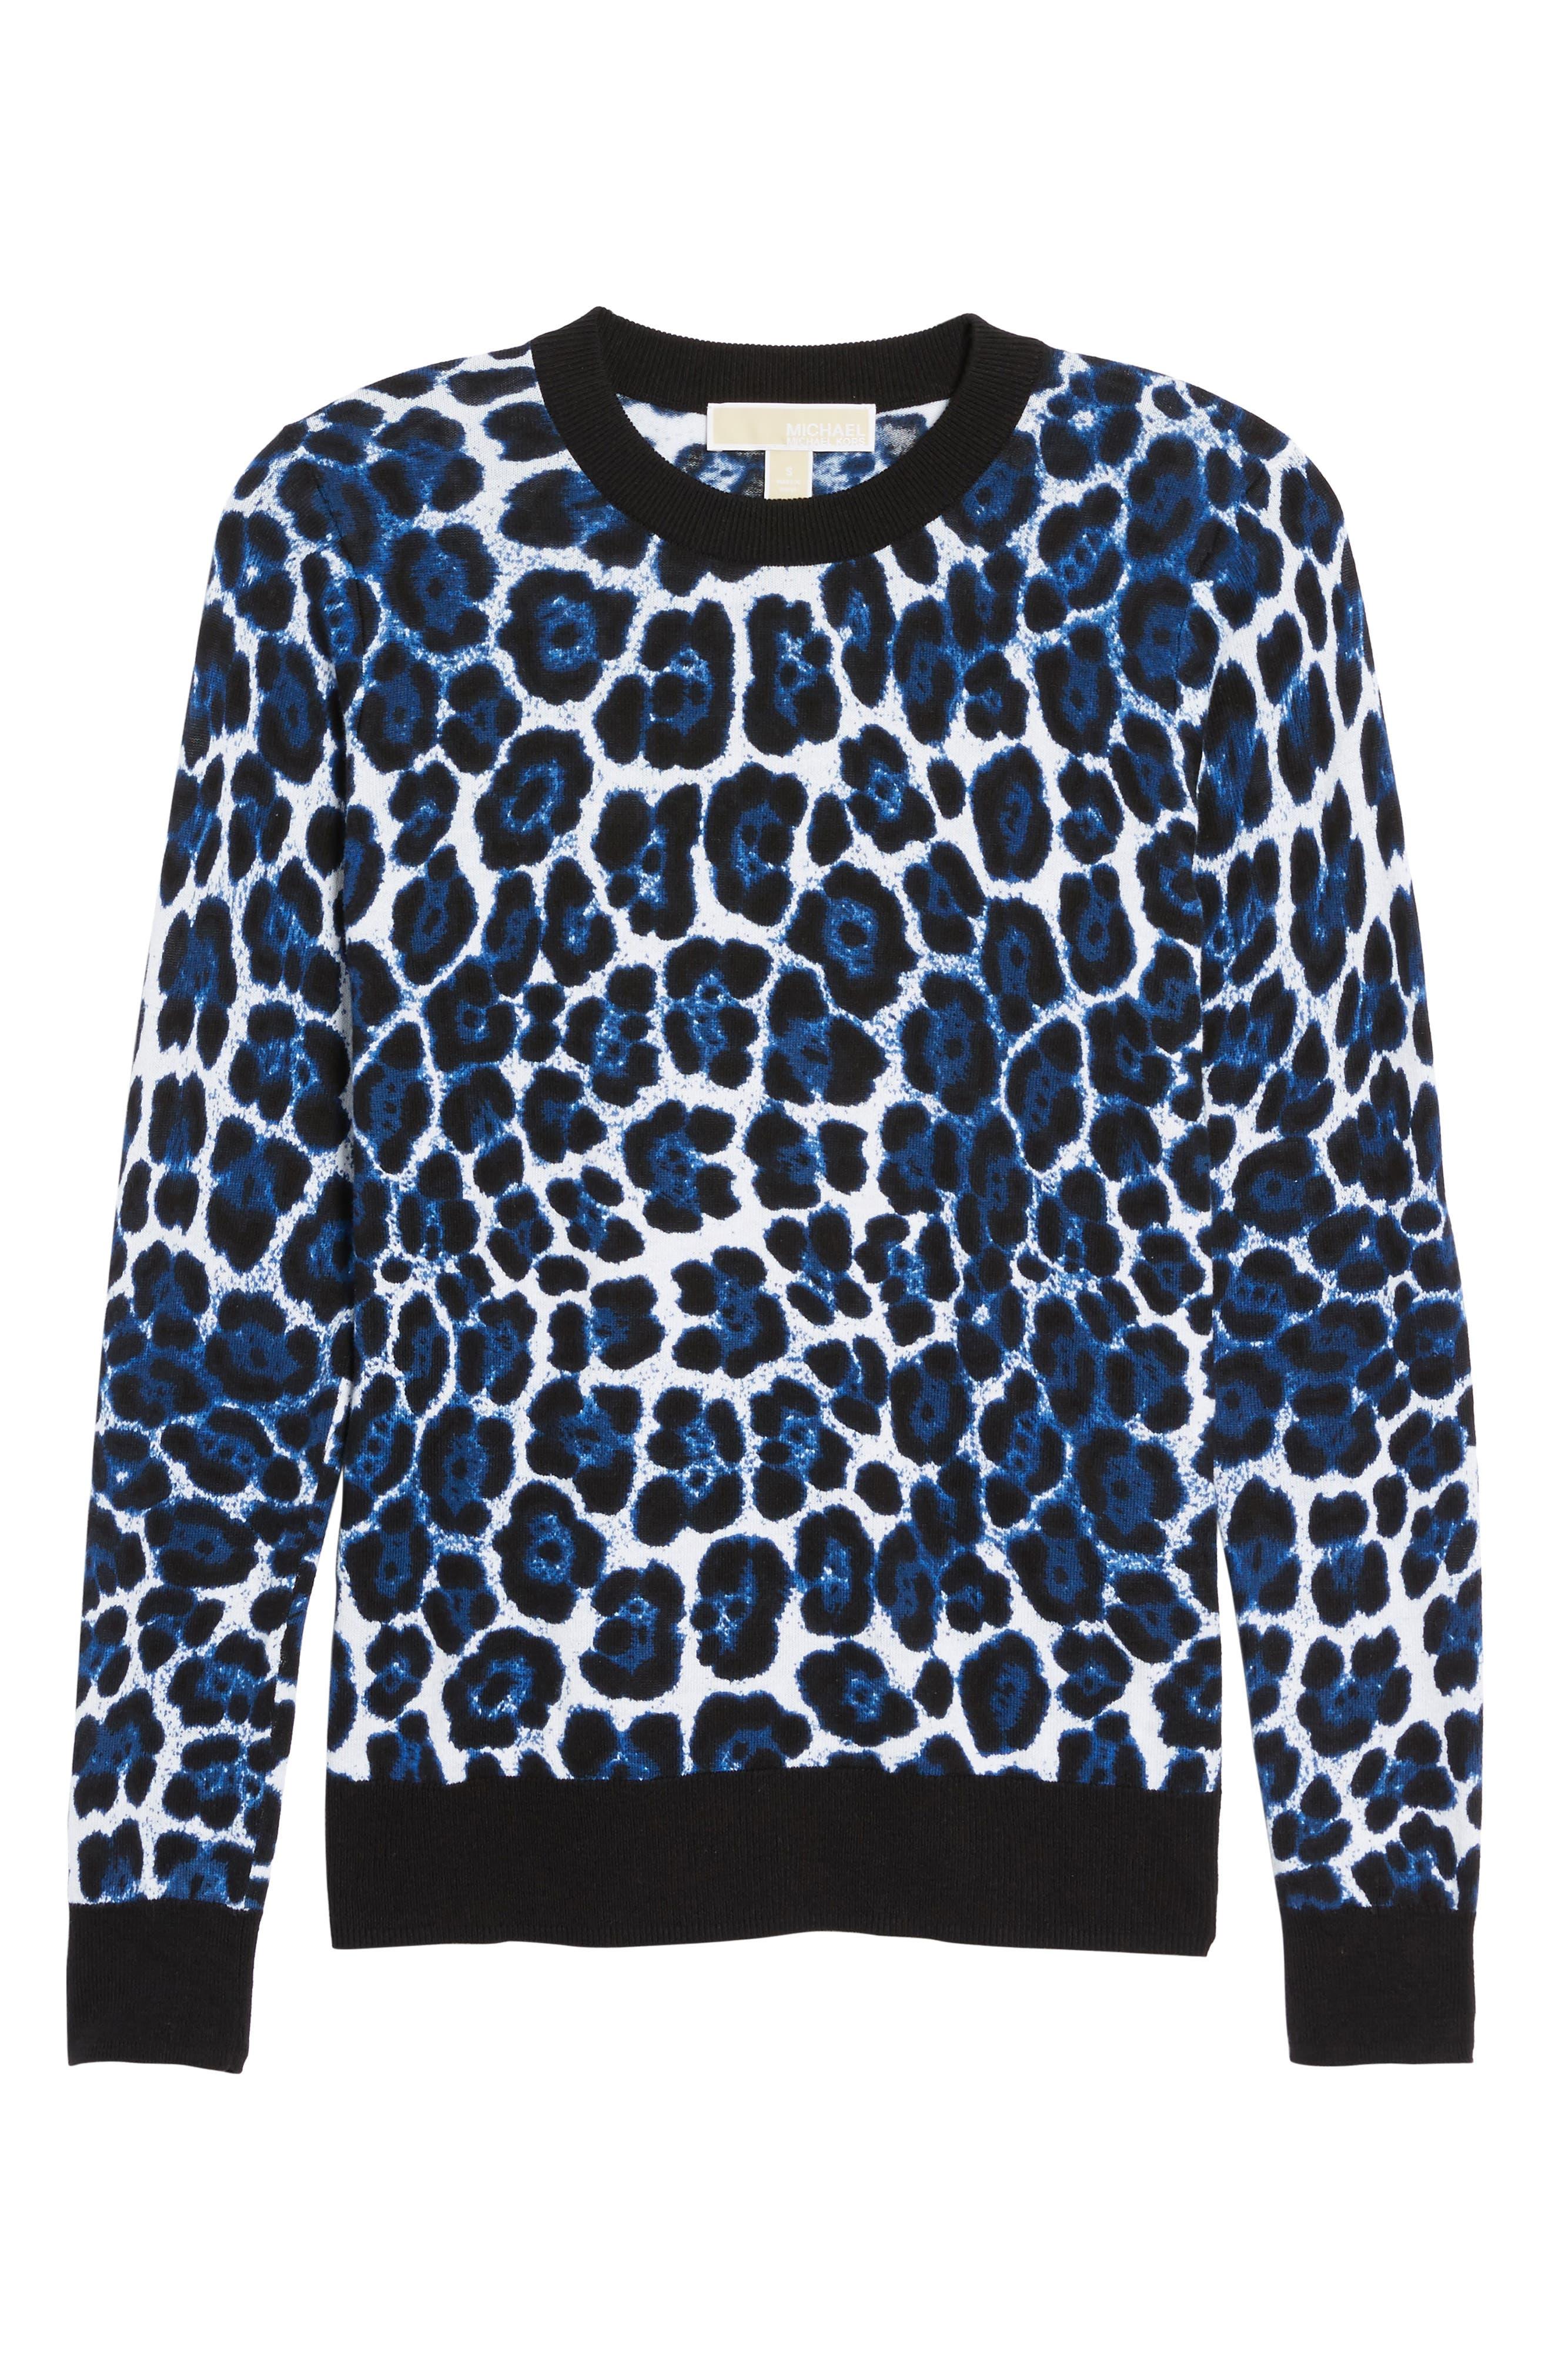 Cheetah Print Sweater,                             Alternate thumbnail 6, color,                             403